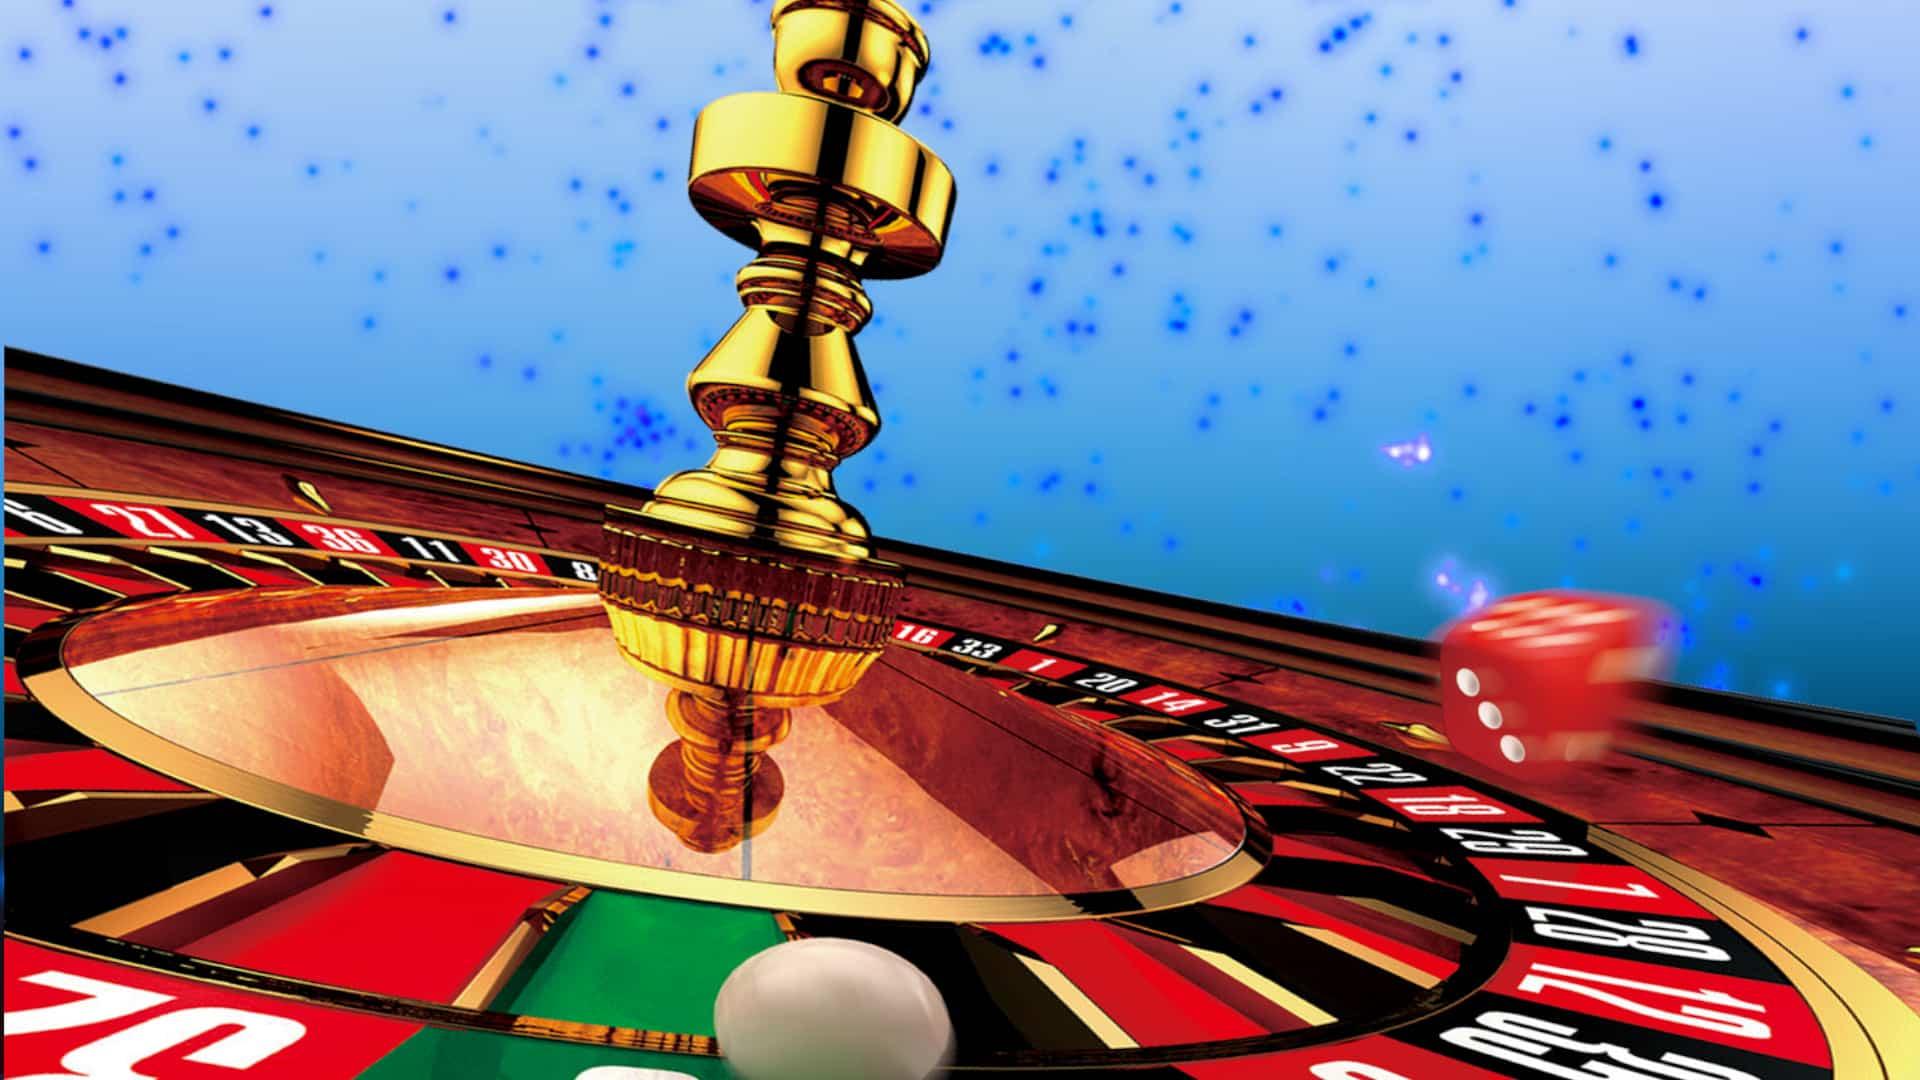 ruleta ¿Cómo jugar a la ruleta de casino?